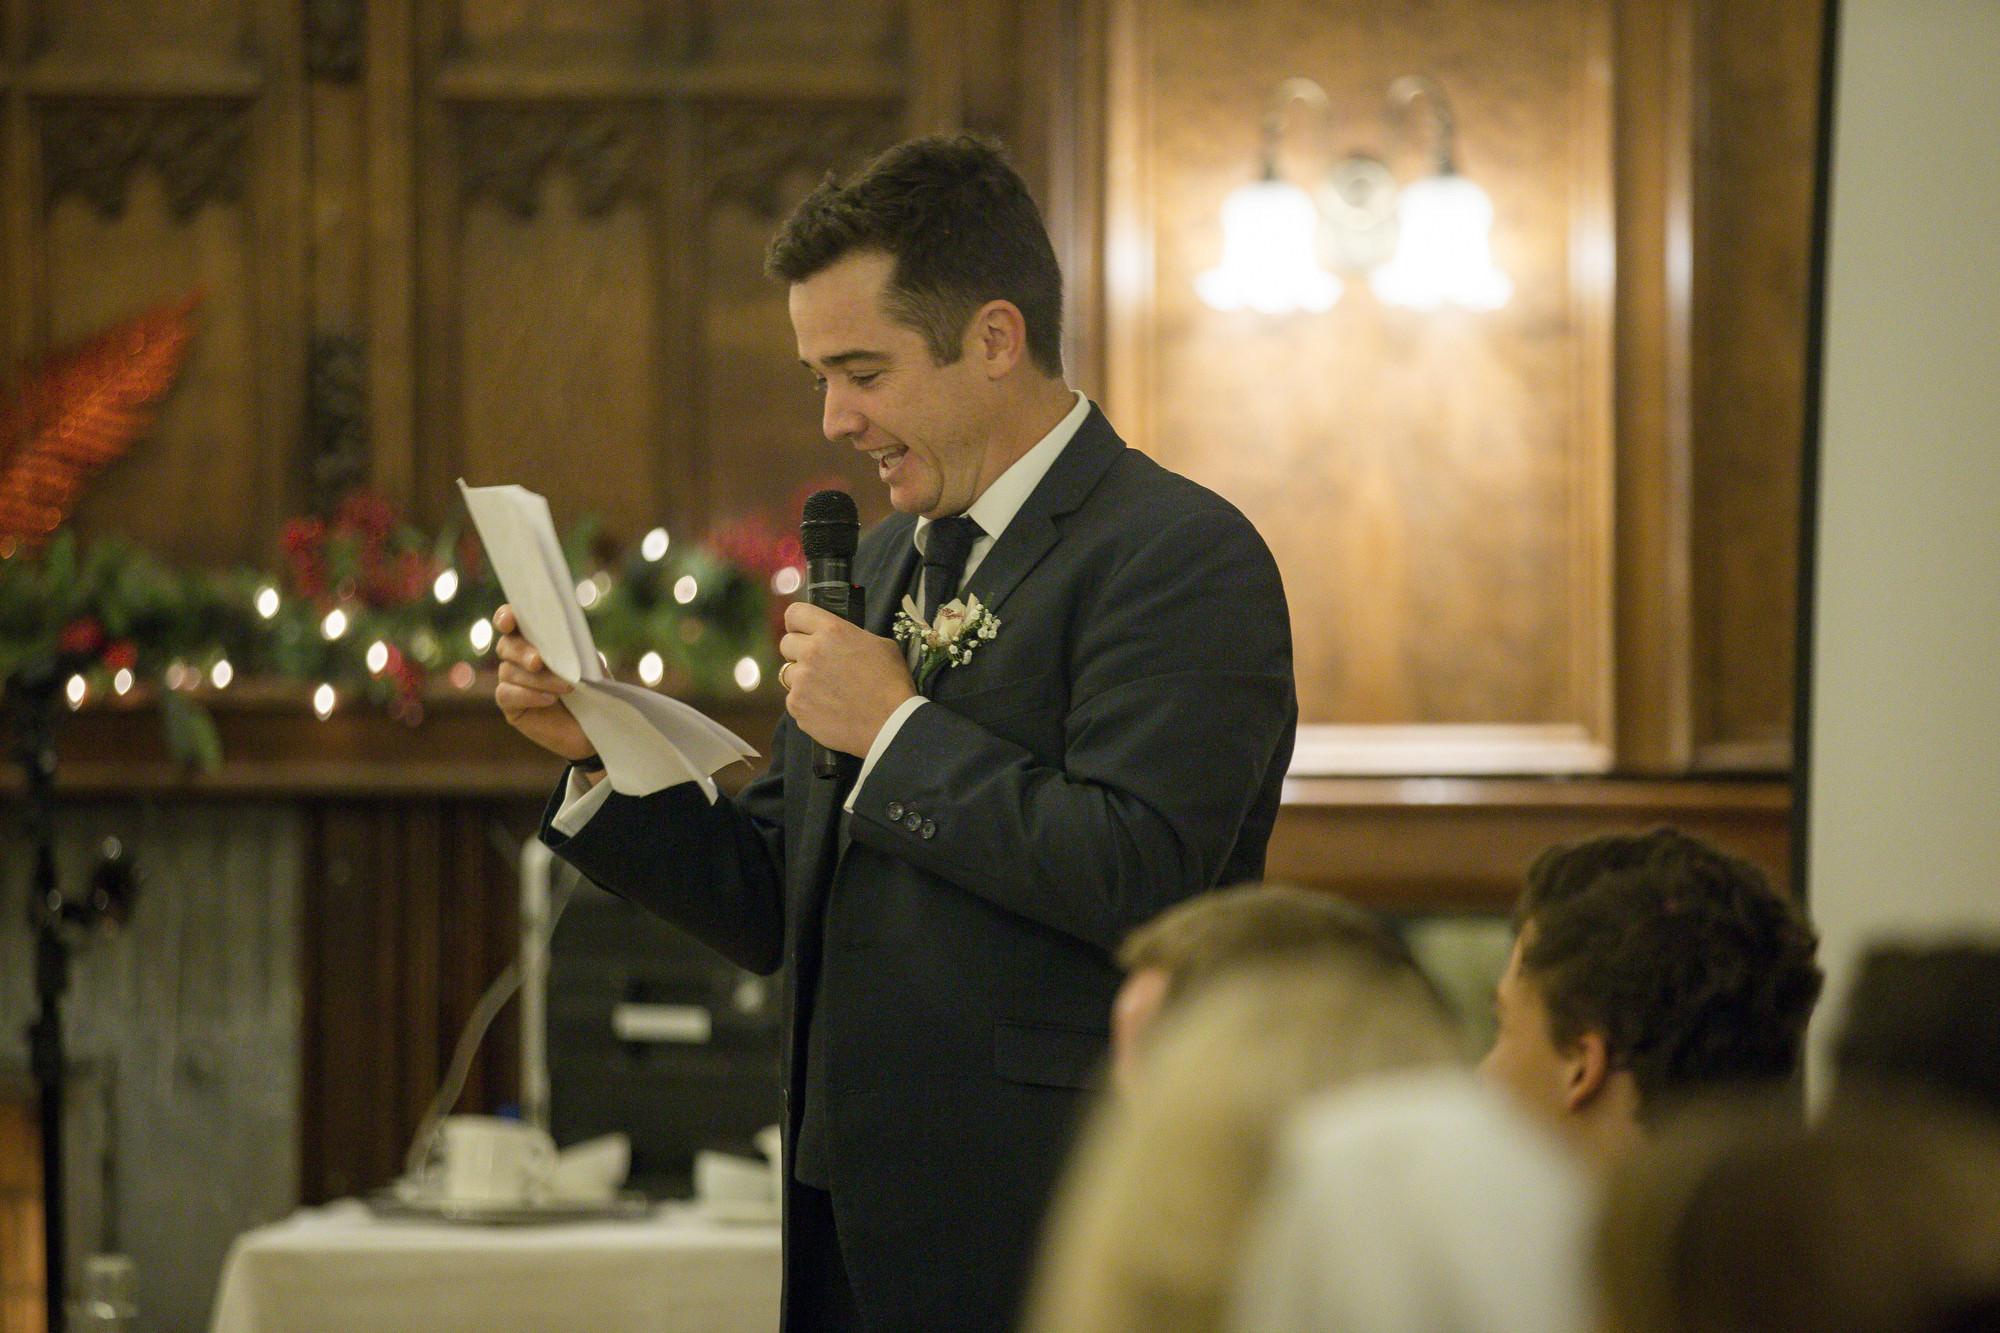 muckross_park_hotel_grougane_barra_wedding_photographer_goldenmoments_073.jpg